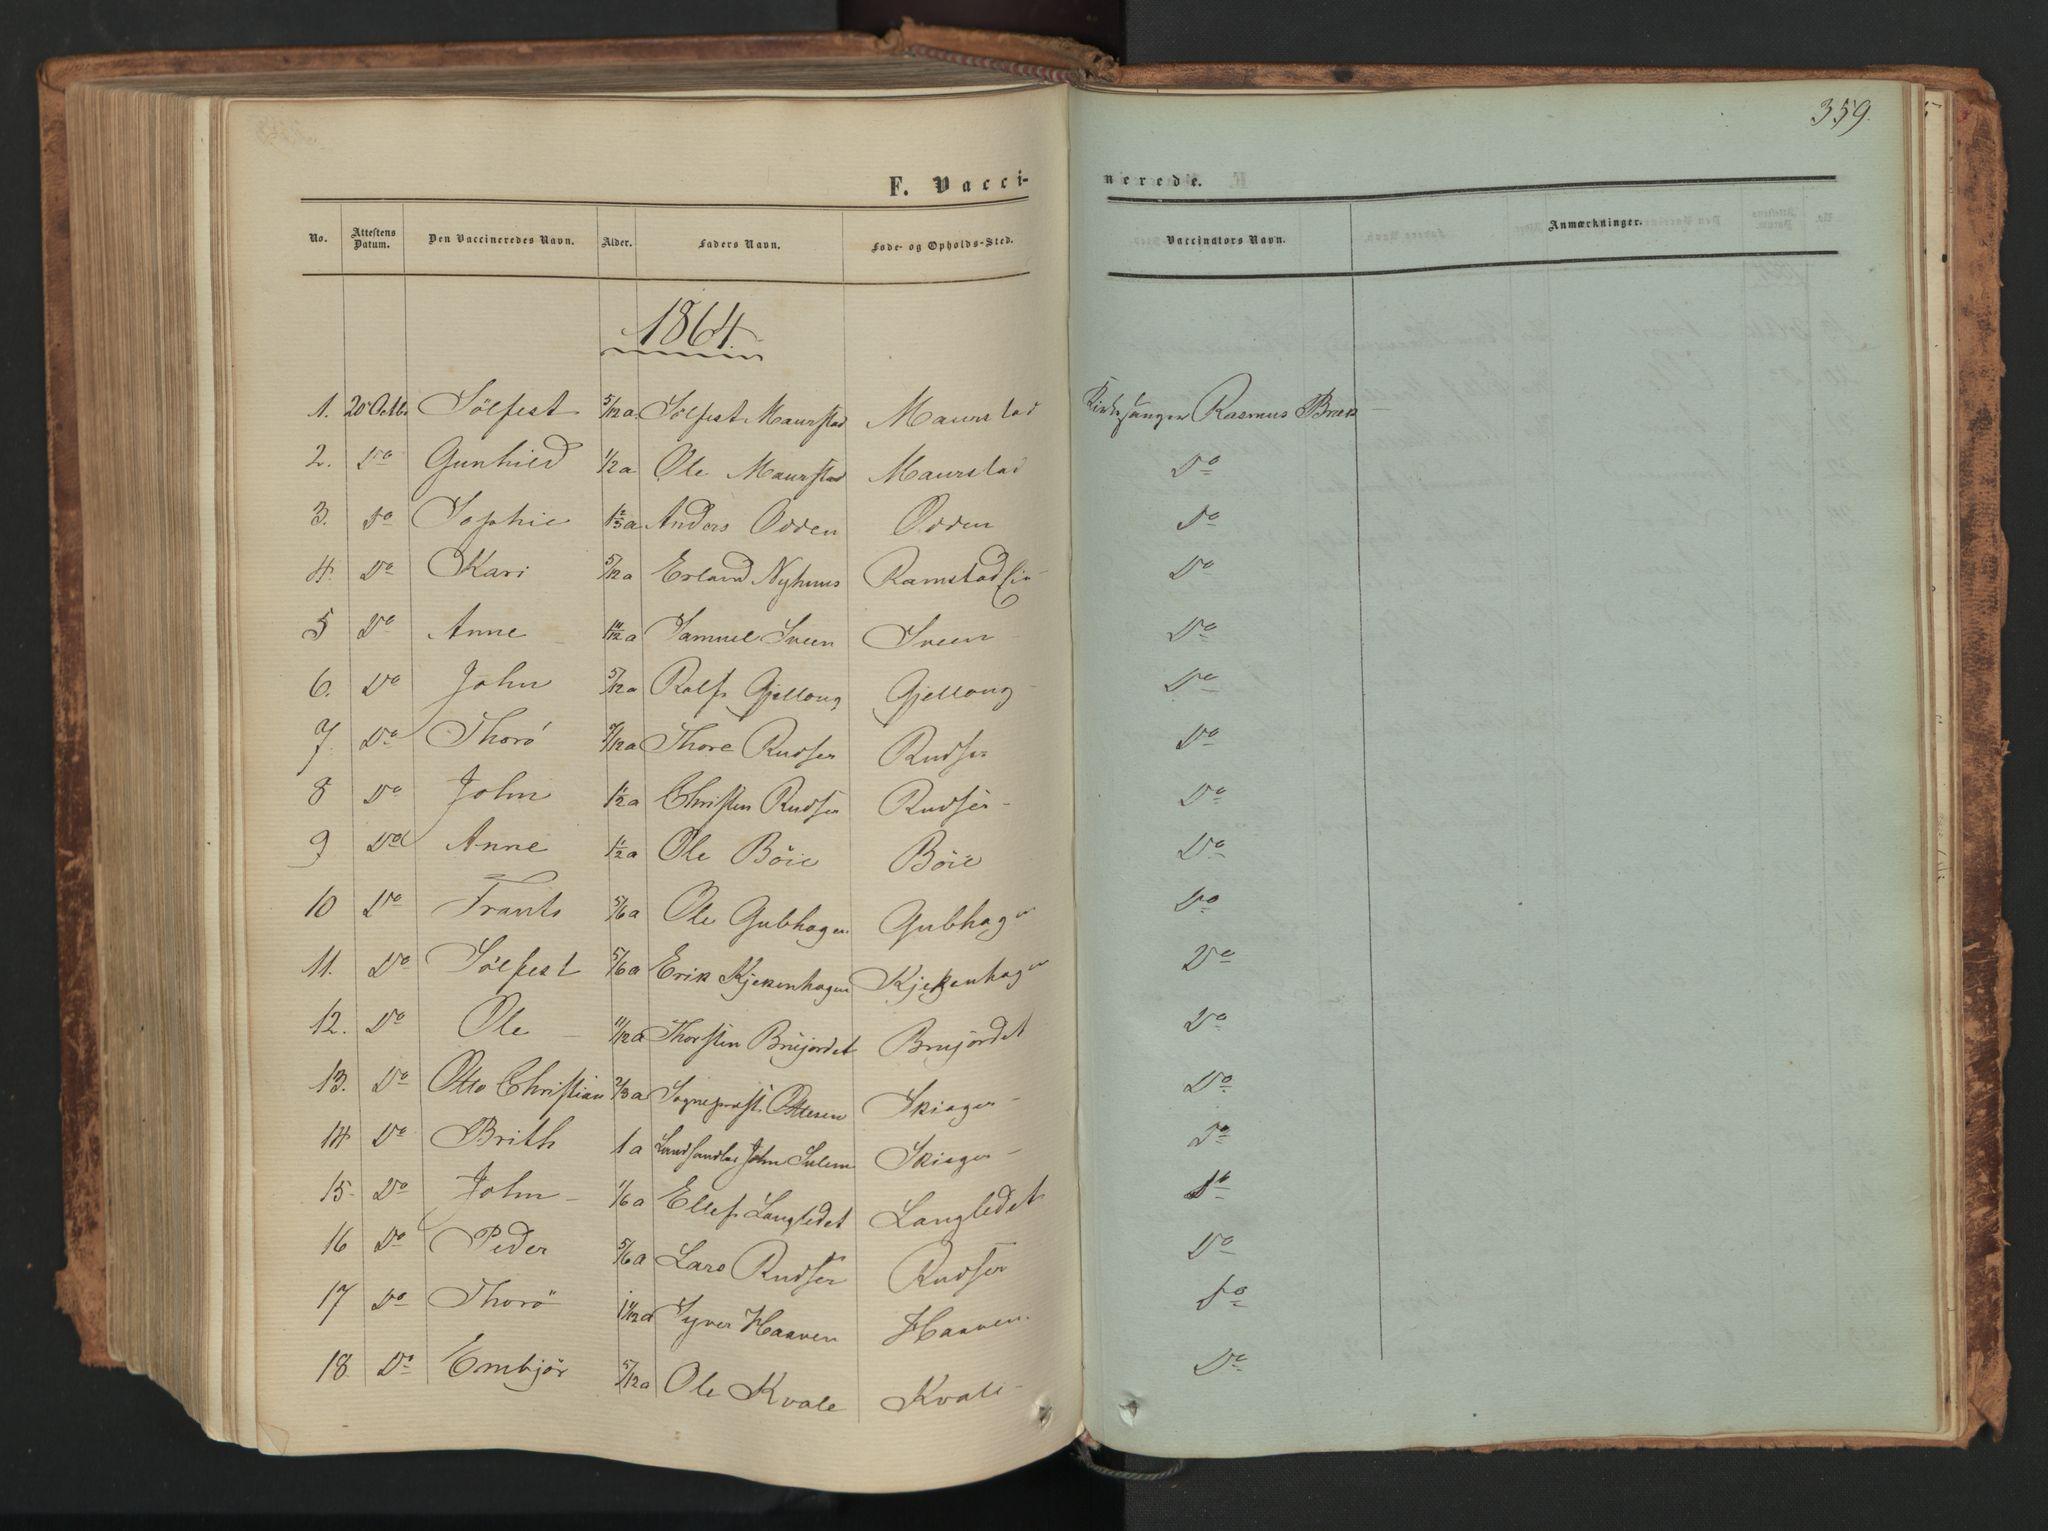 SAH, Skjåk prestekontor, Ministerialbok nr. 1, 1863-1879, s. 359